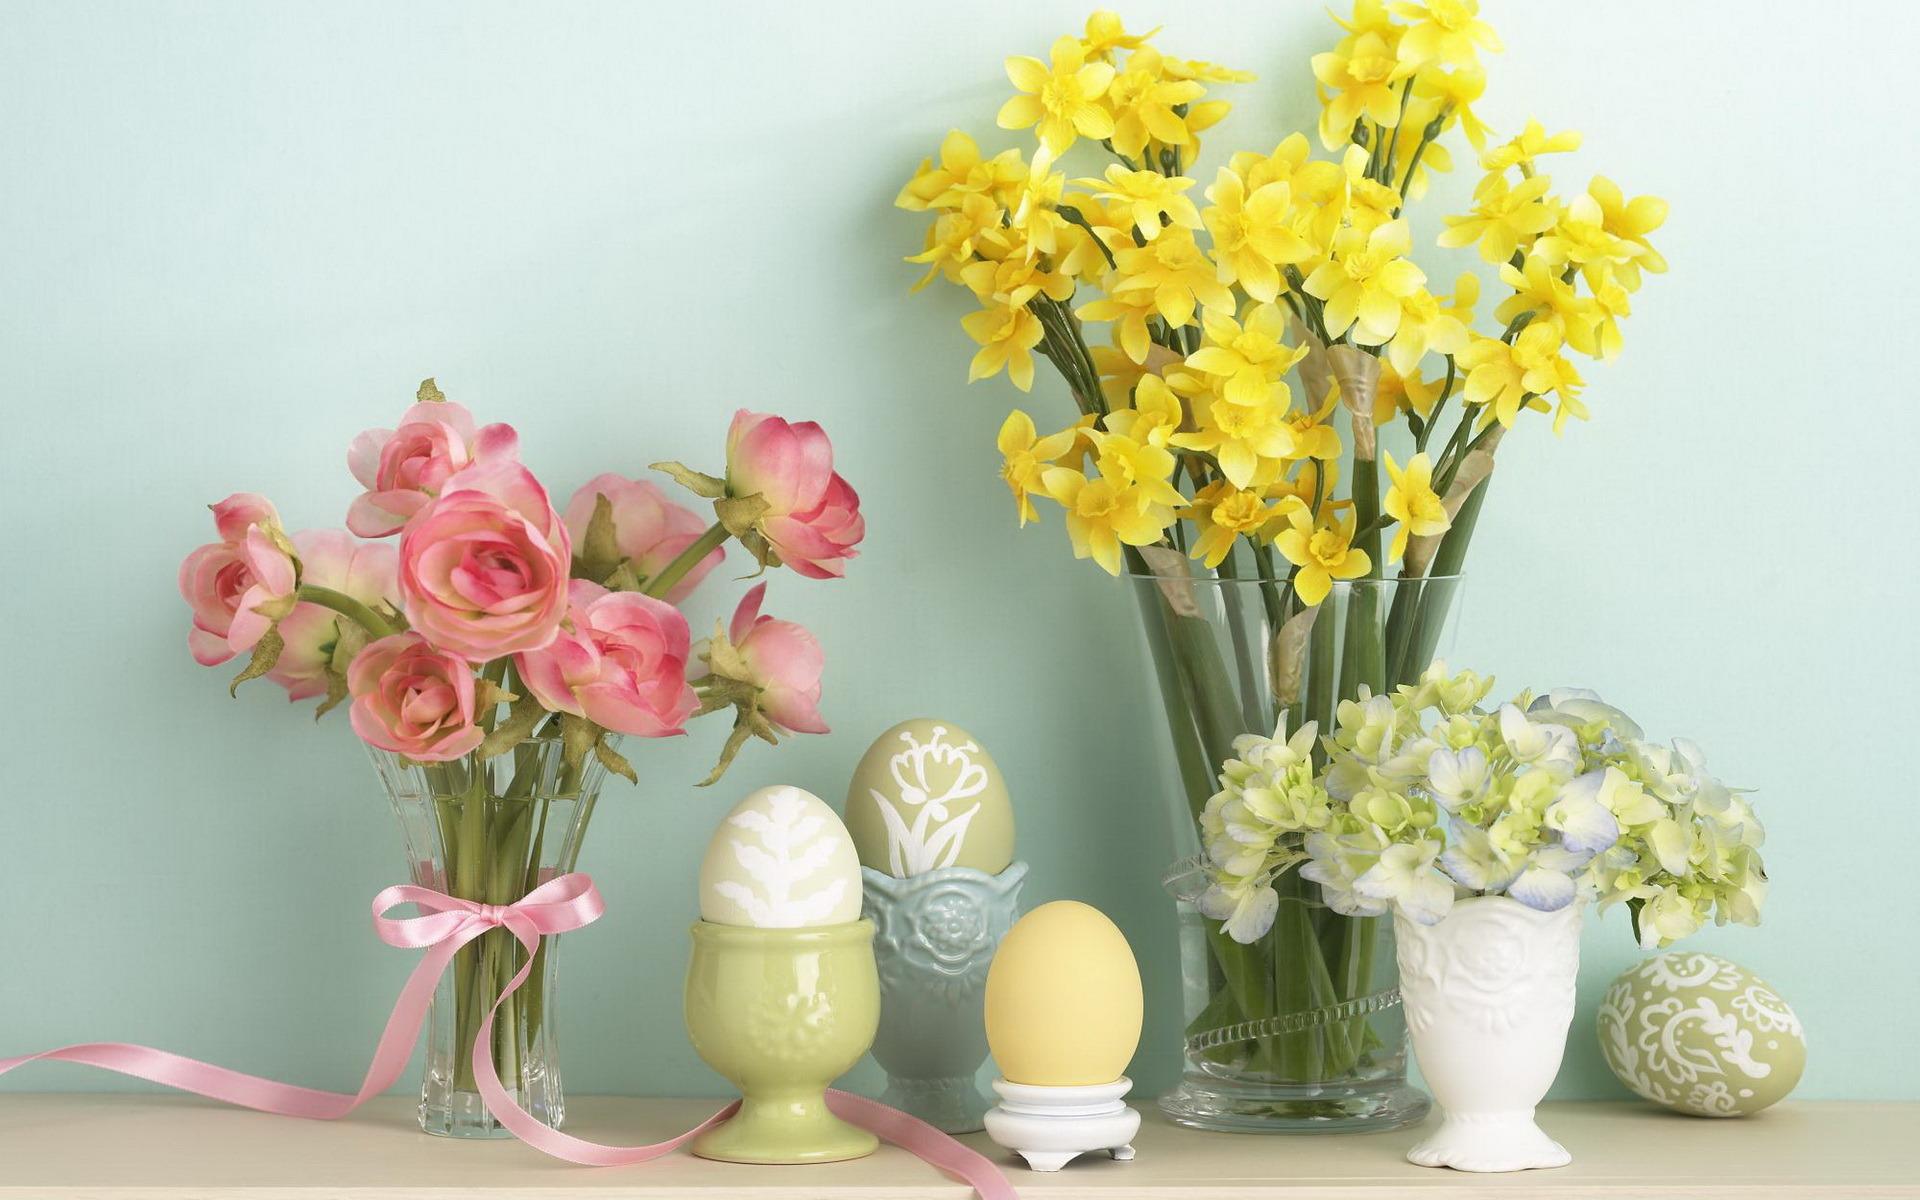 Flowers in the vase wallpaper   1348474 1920x1200